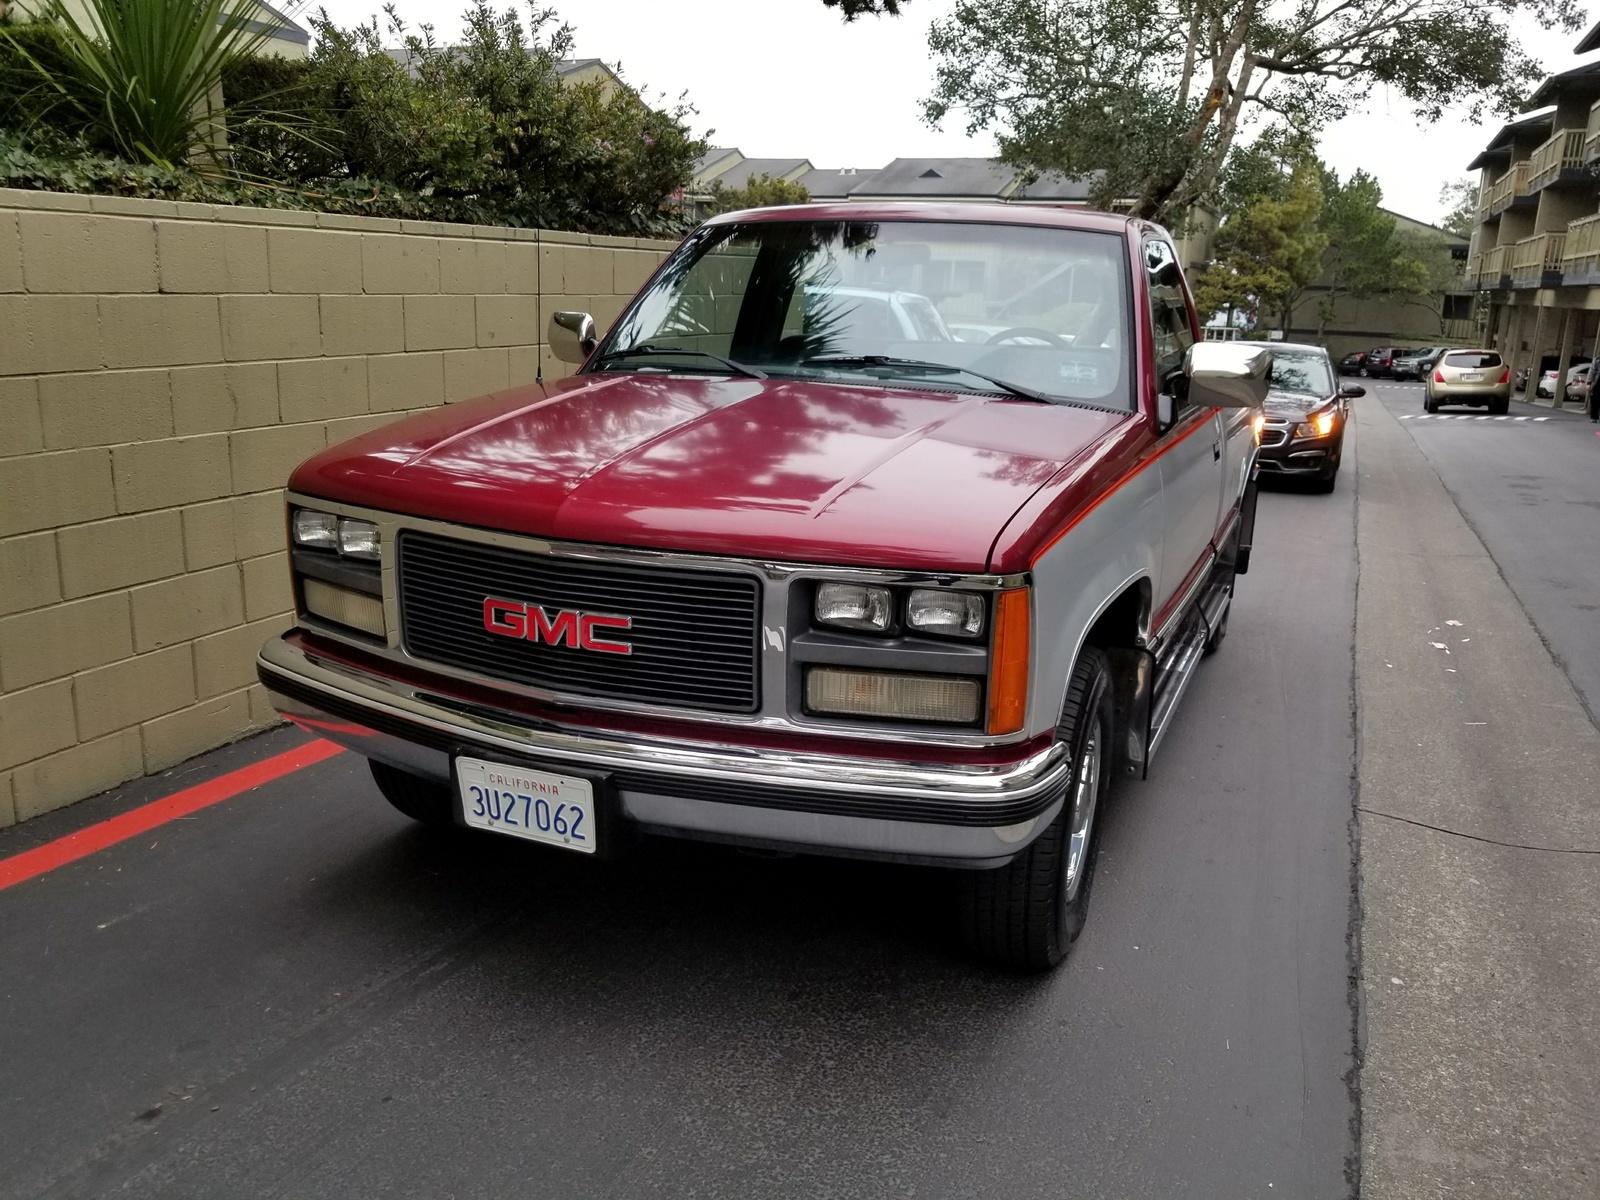 1989 Gmc Sierra 3500 - Overview